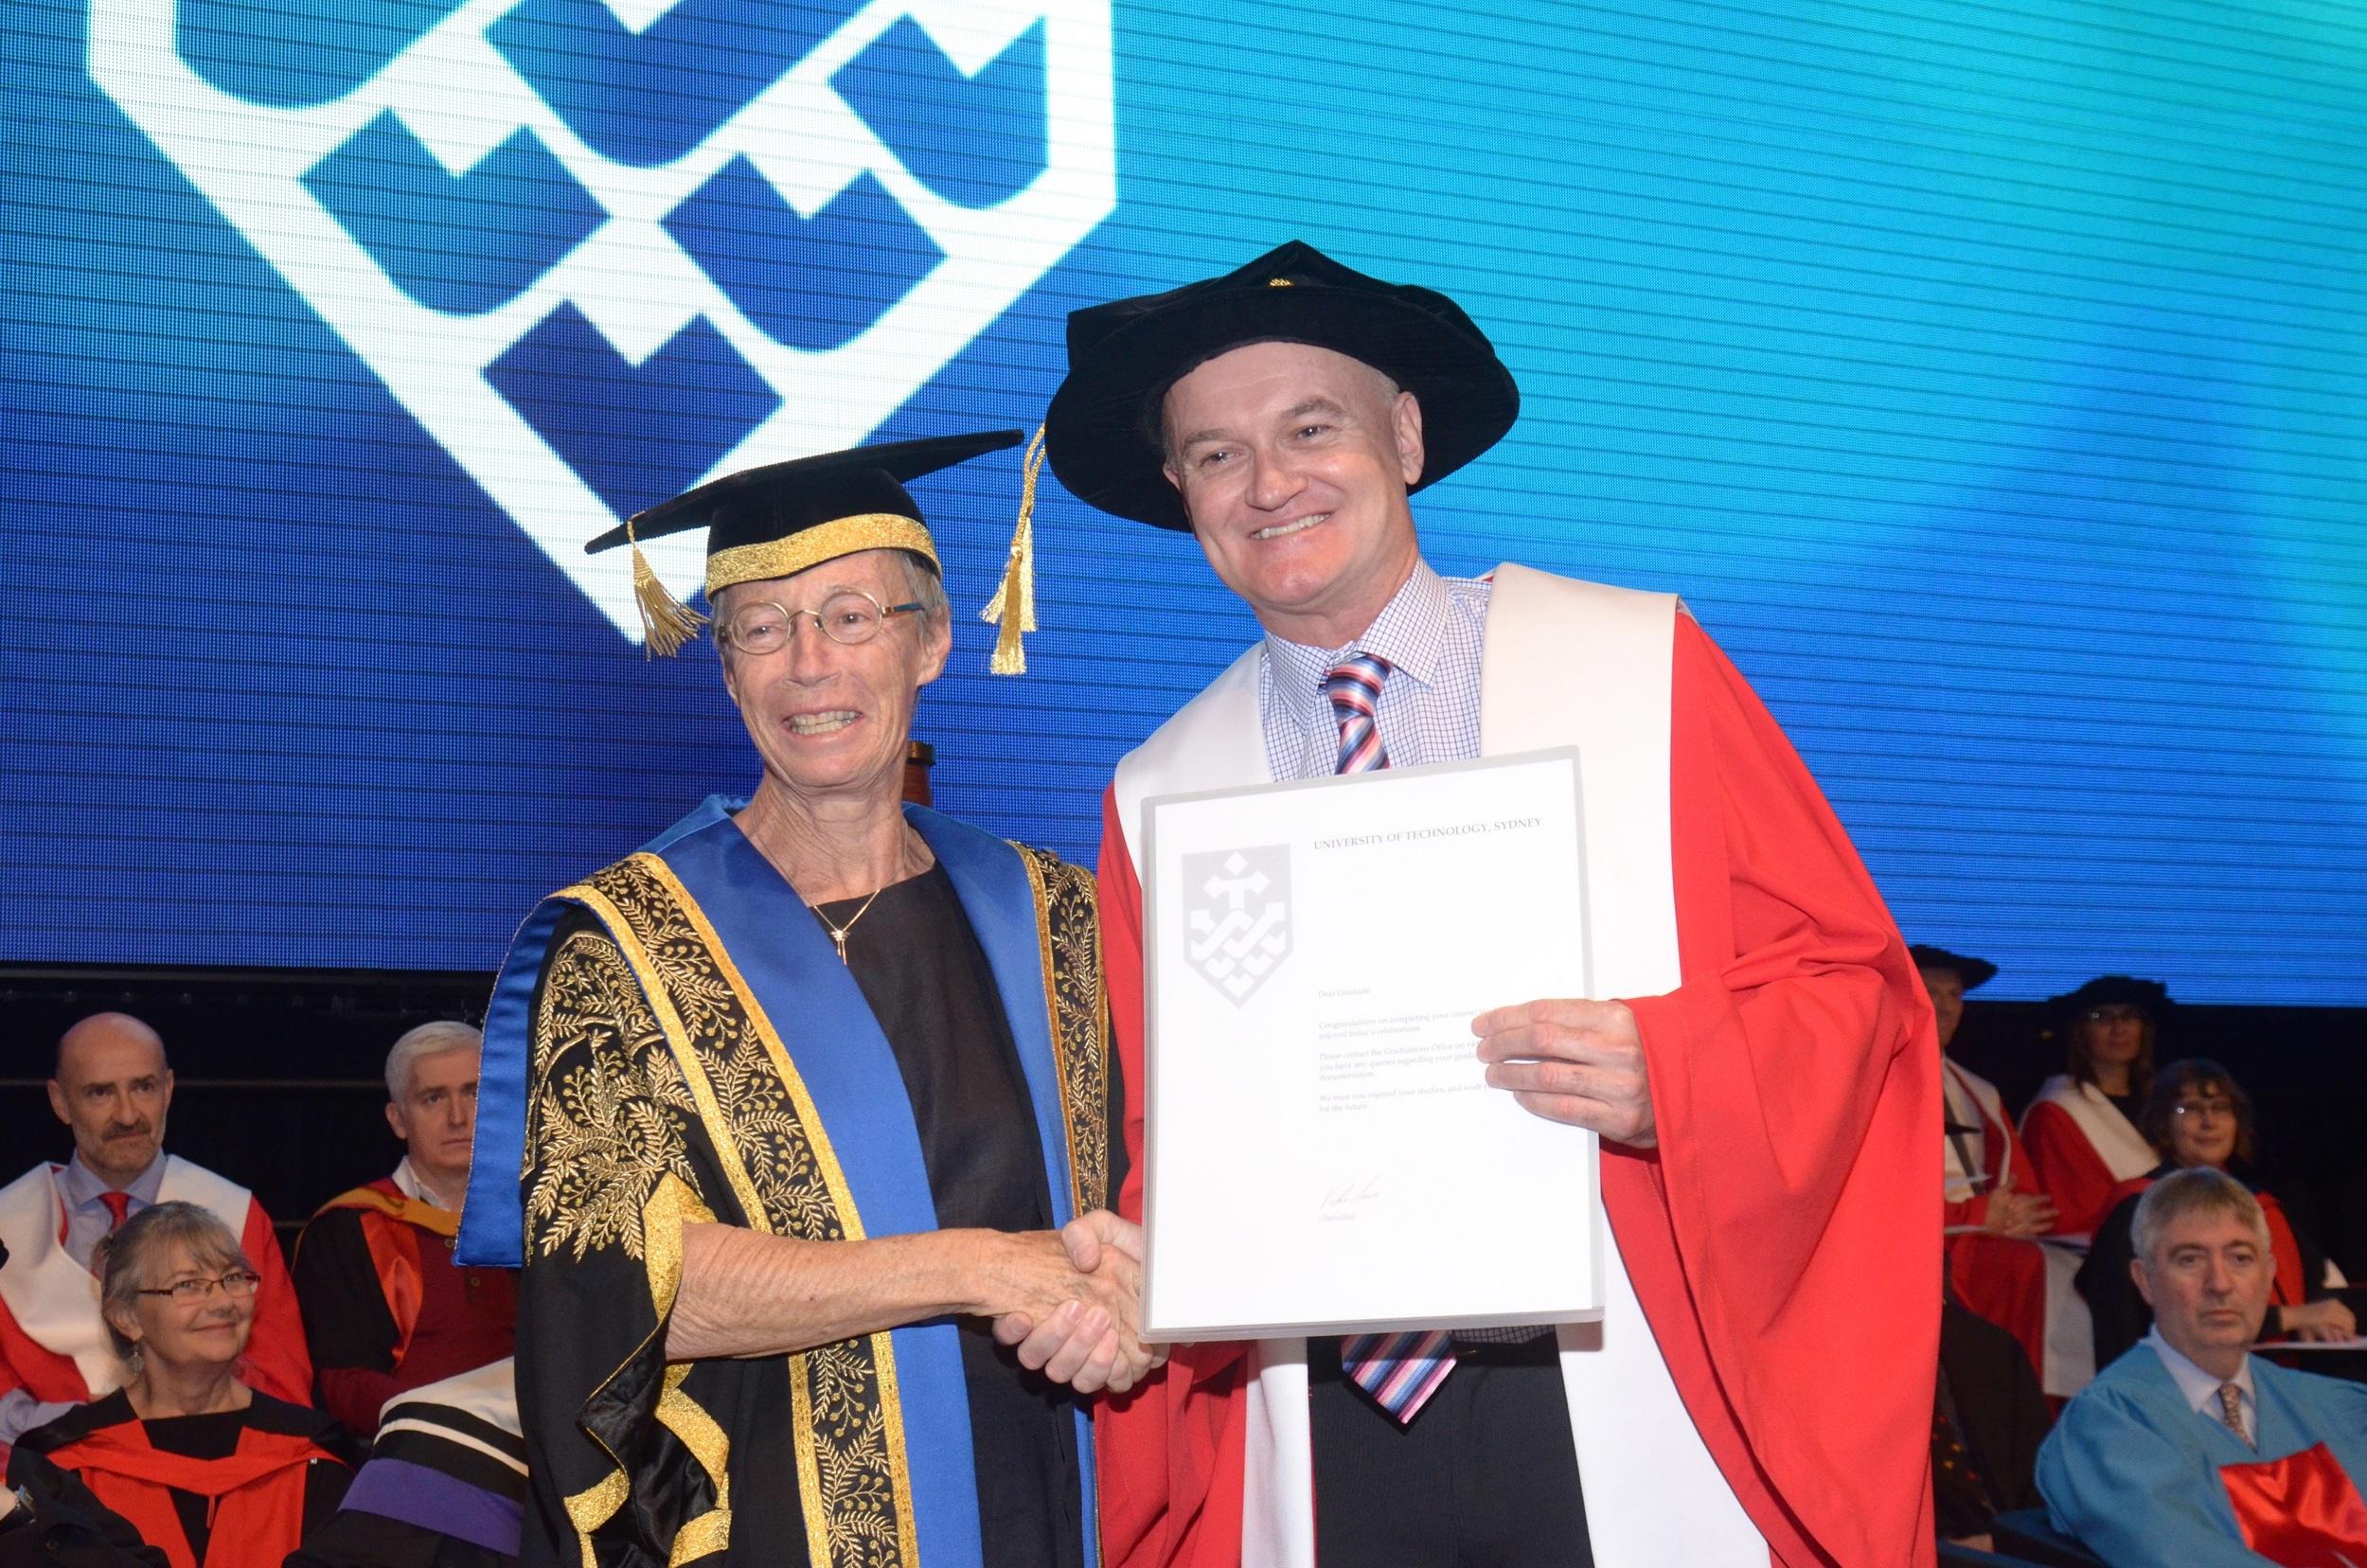 david-dyer-doctorate.jpg